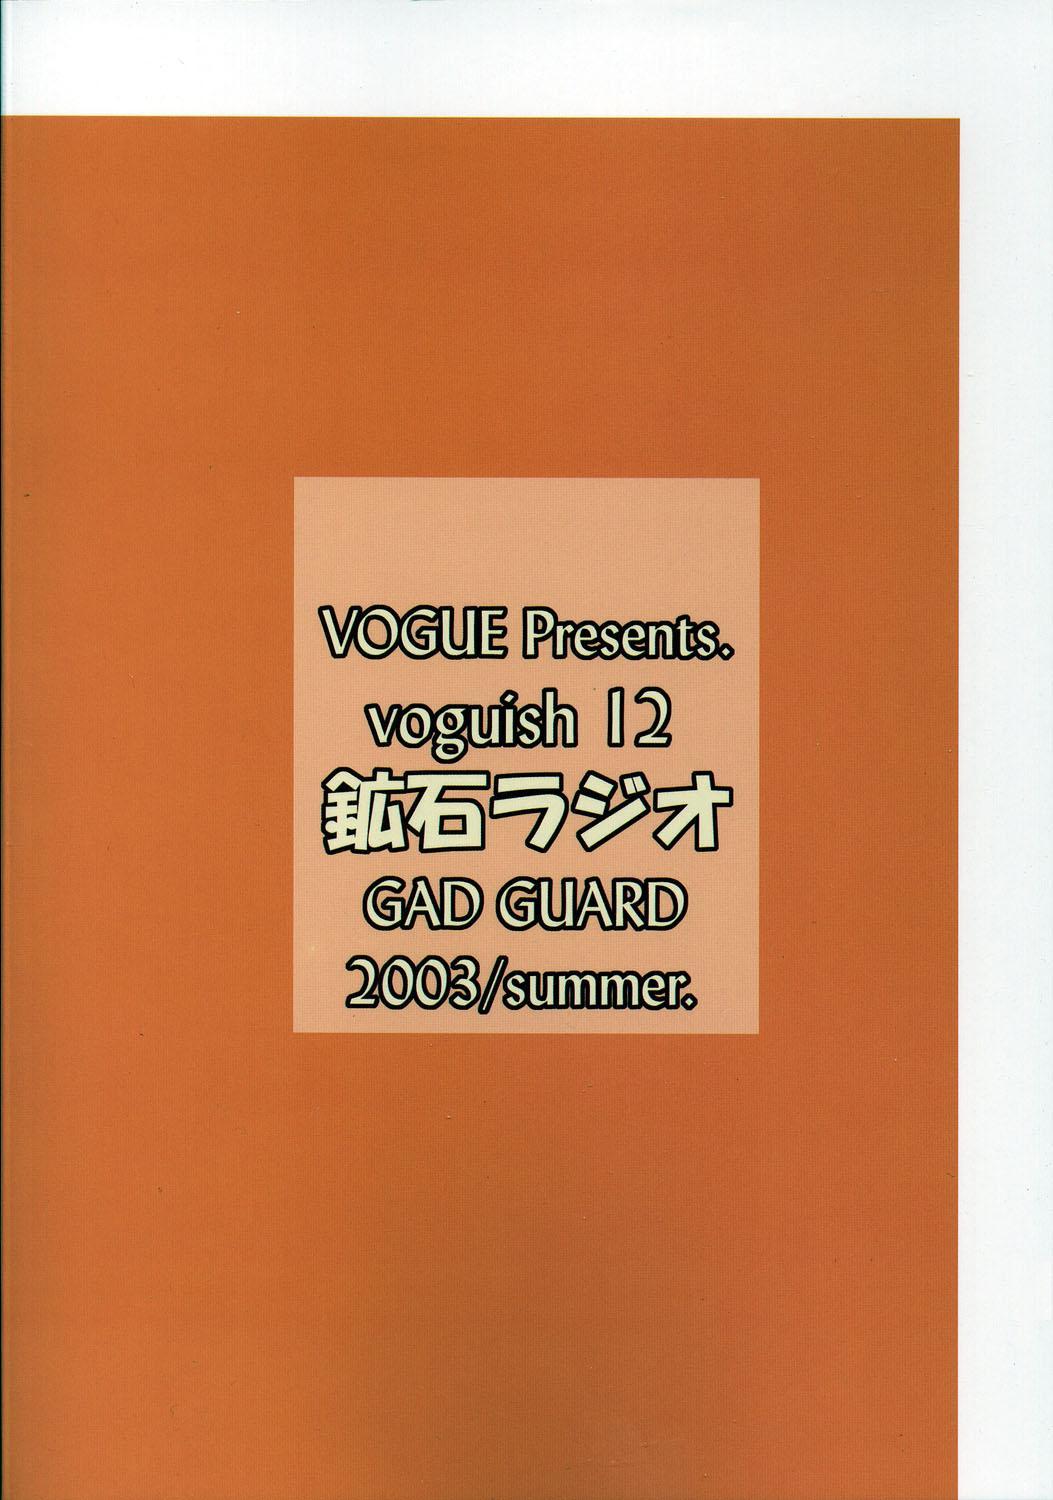 voguish 12 Kouseki Radio 27